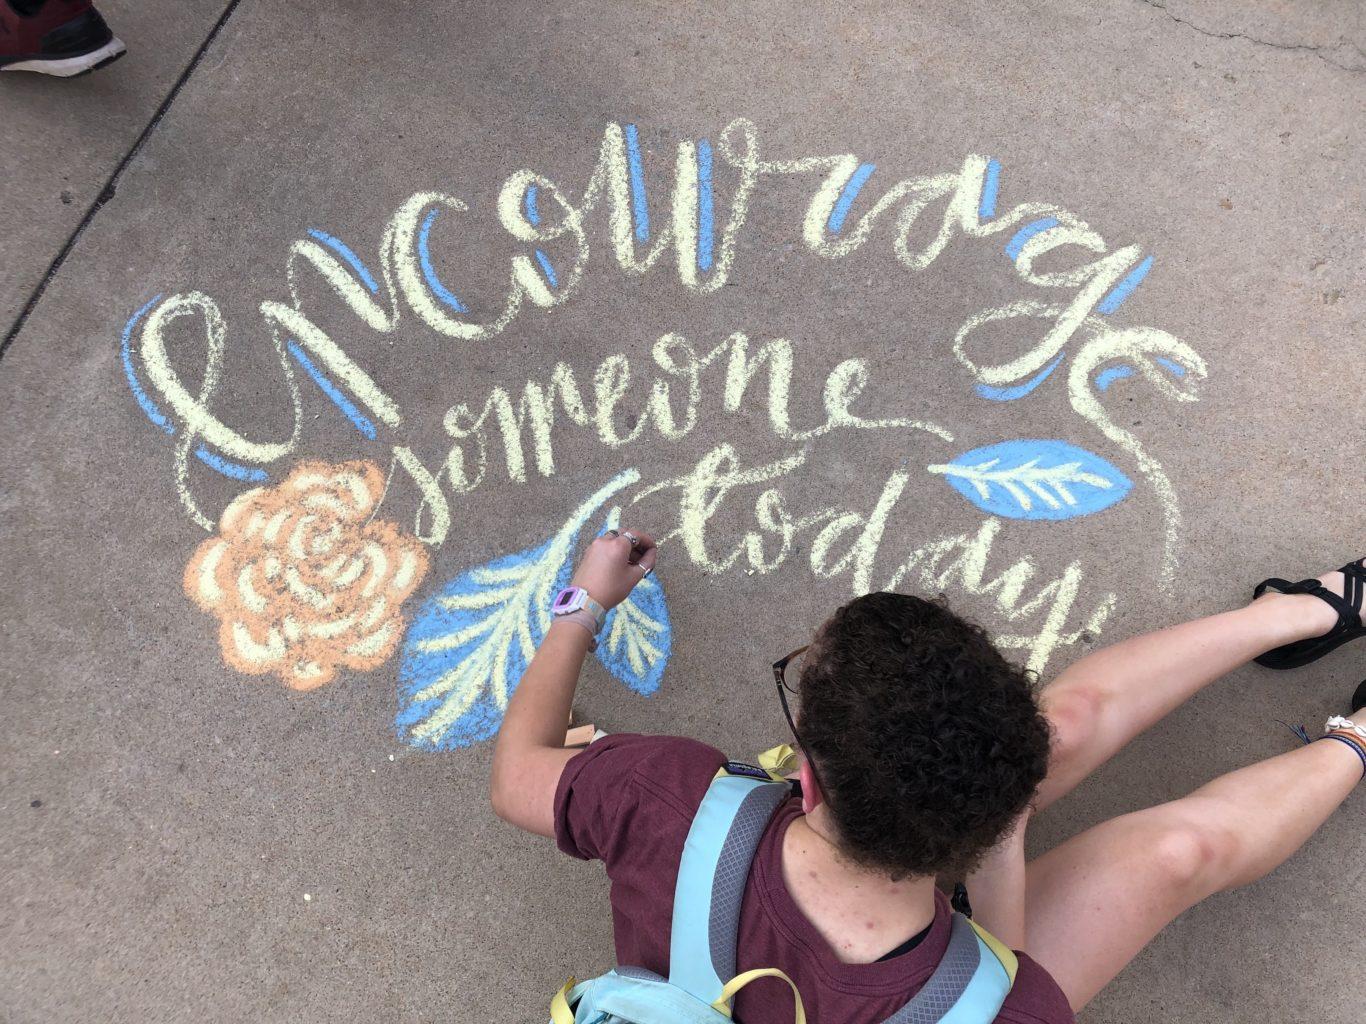 Student doing chalk art